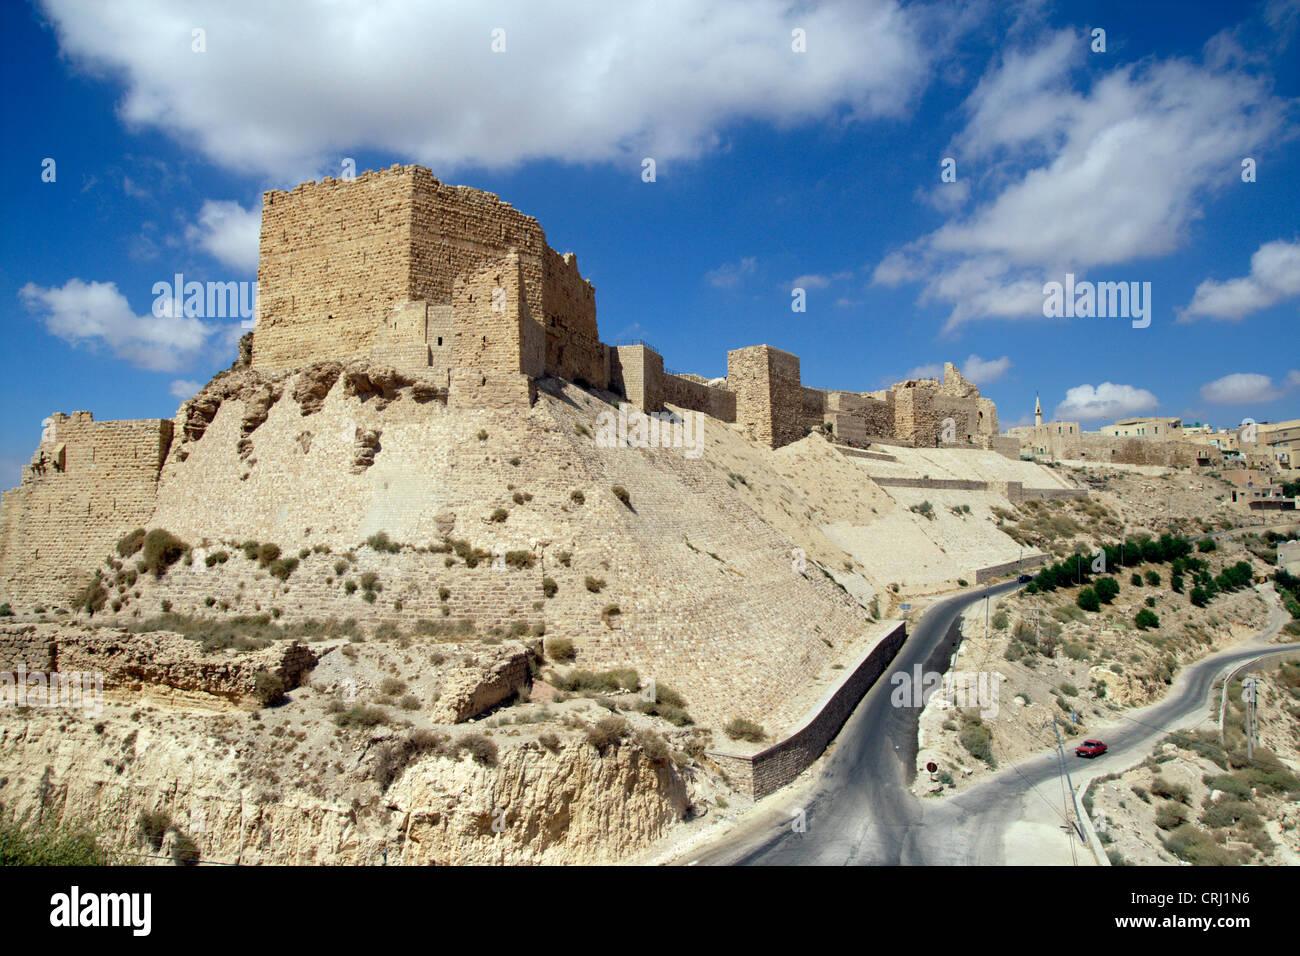 crusader castle of Karak, Jordan, Karakoram Highway Stock Photo